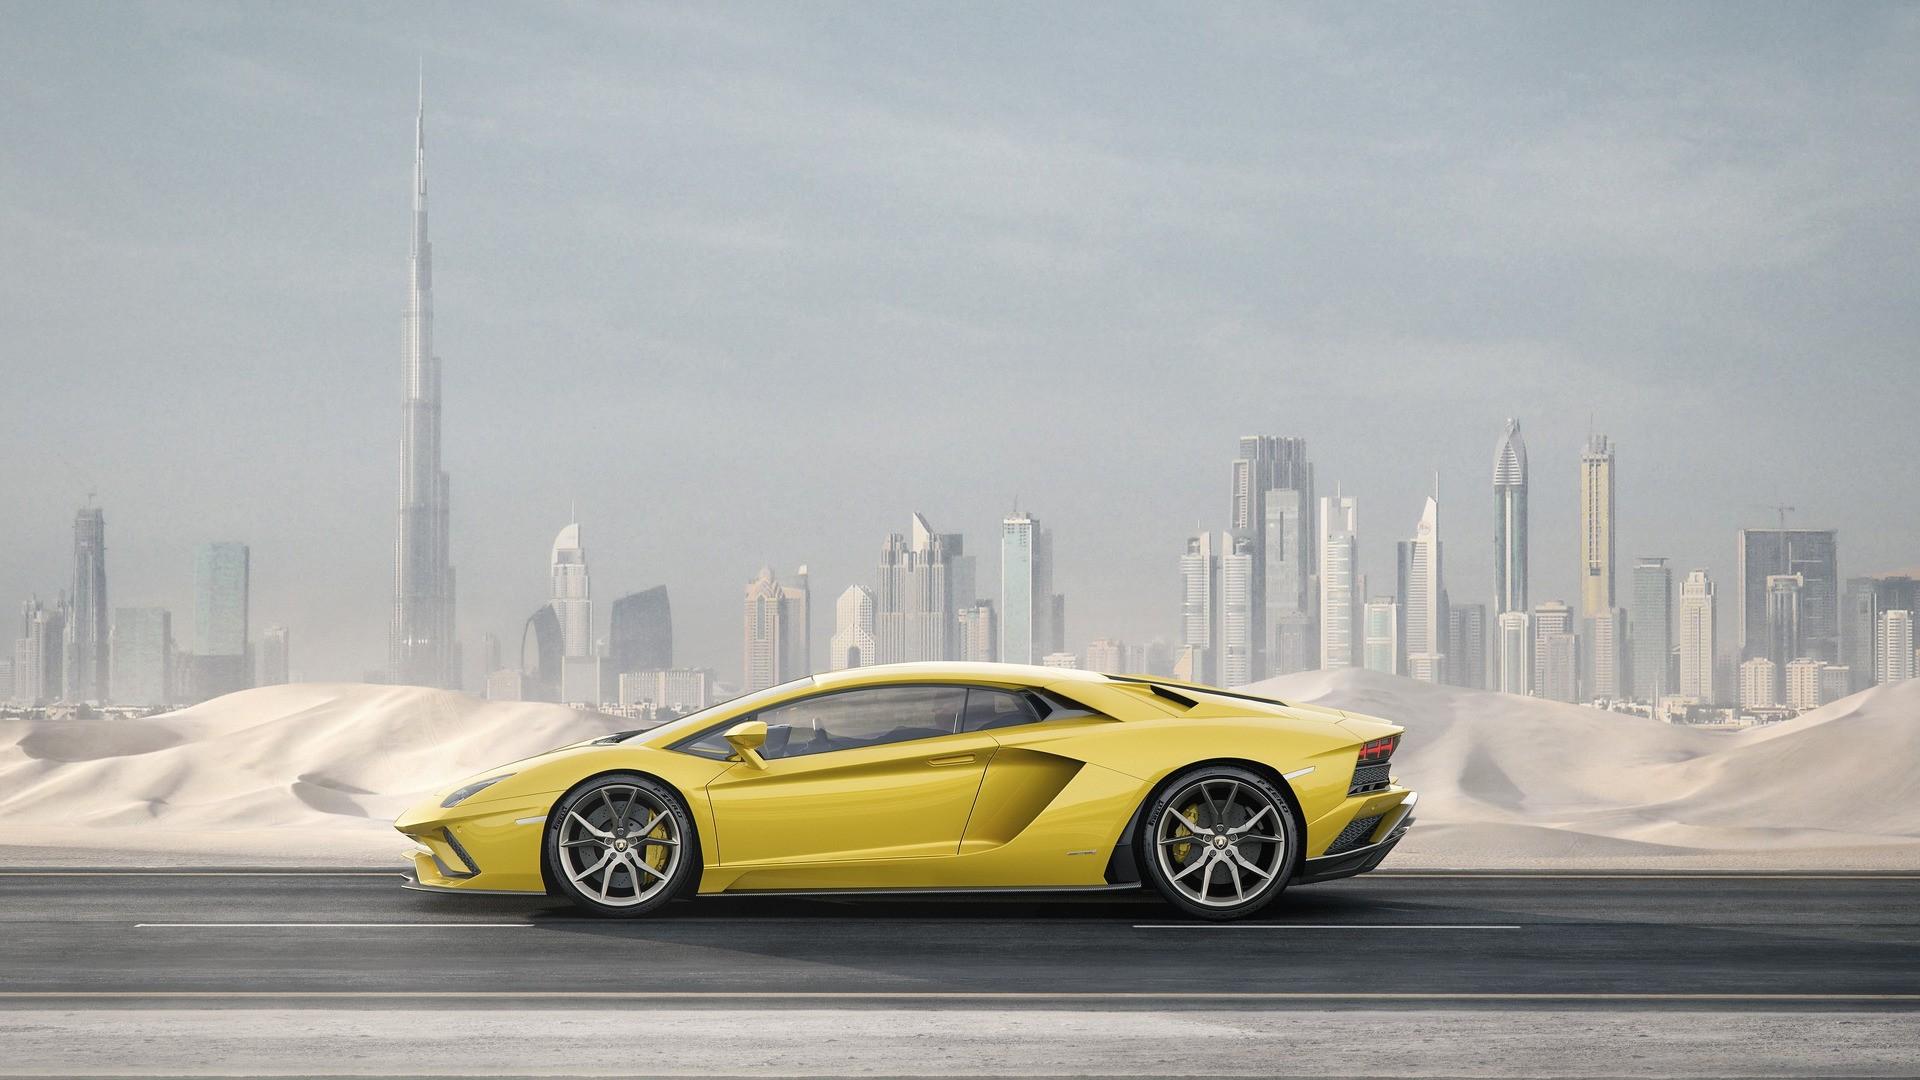 740-hp-lamborghini-aventador-s-mixes-4-wheel-steering-with-new-electronic-brain_3 Breathtaking Lamborghini Countach Owners Manual Pdf Cars Trend